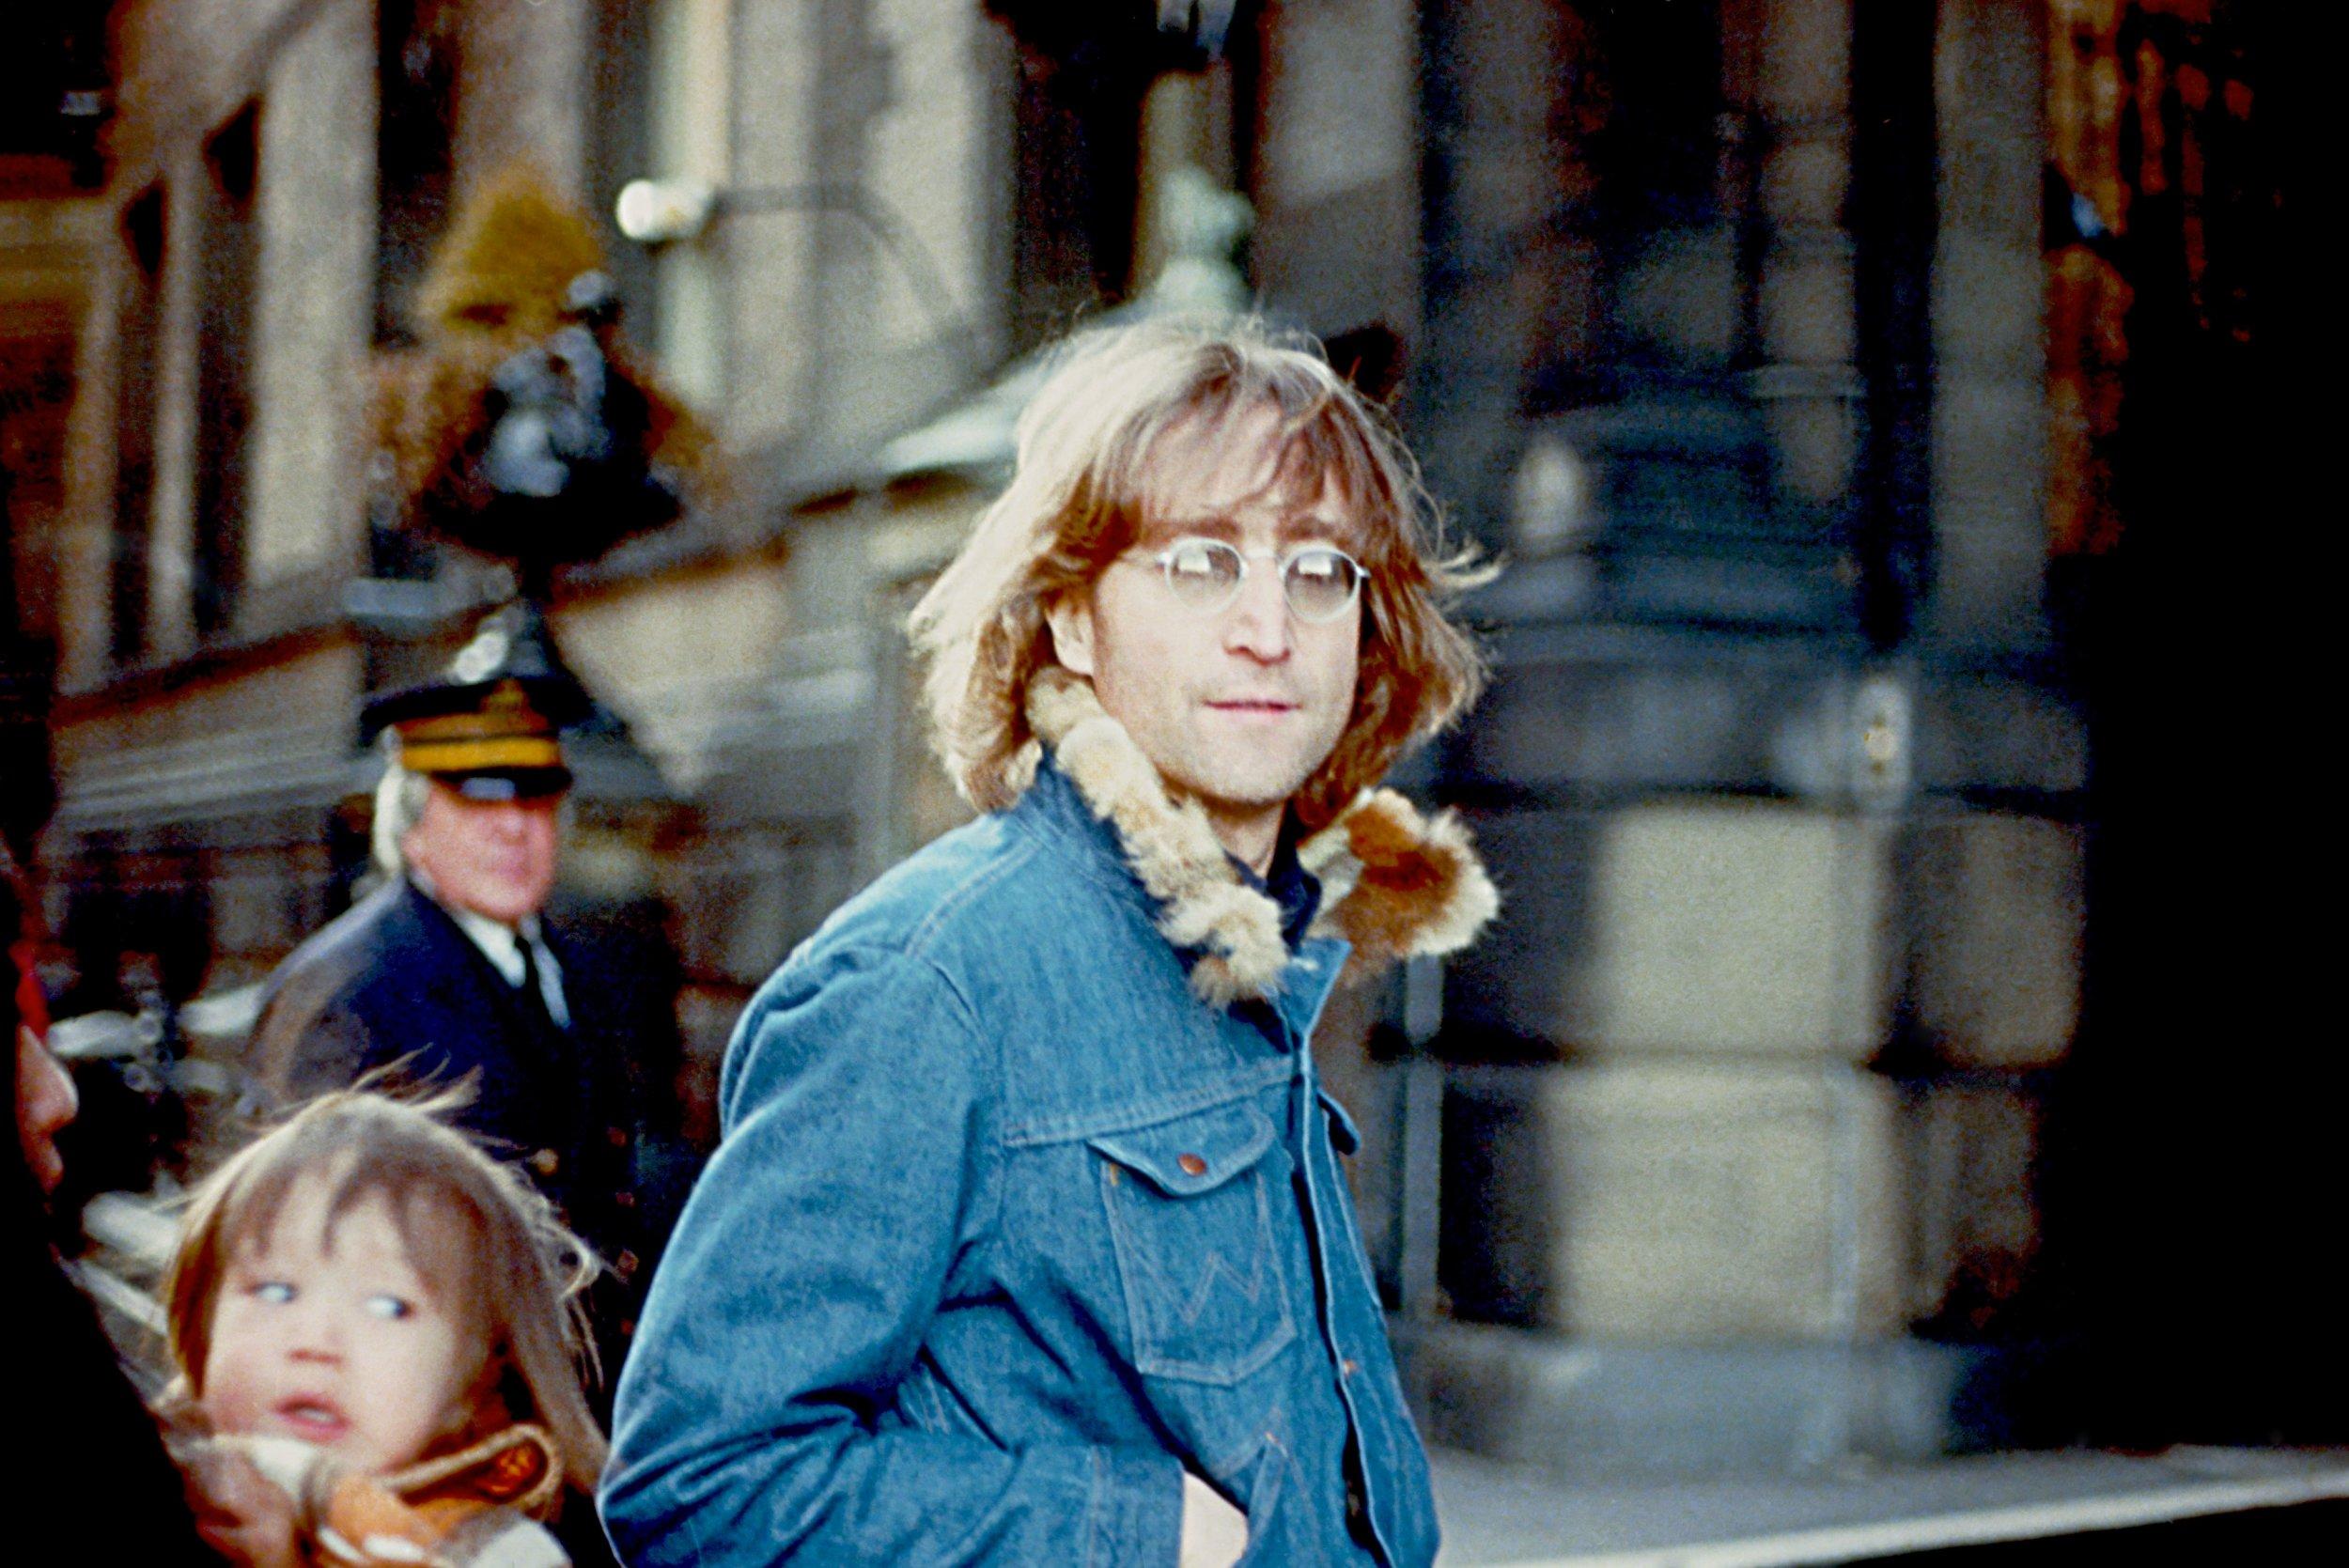 John Lennon killer denied parole for ninth time